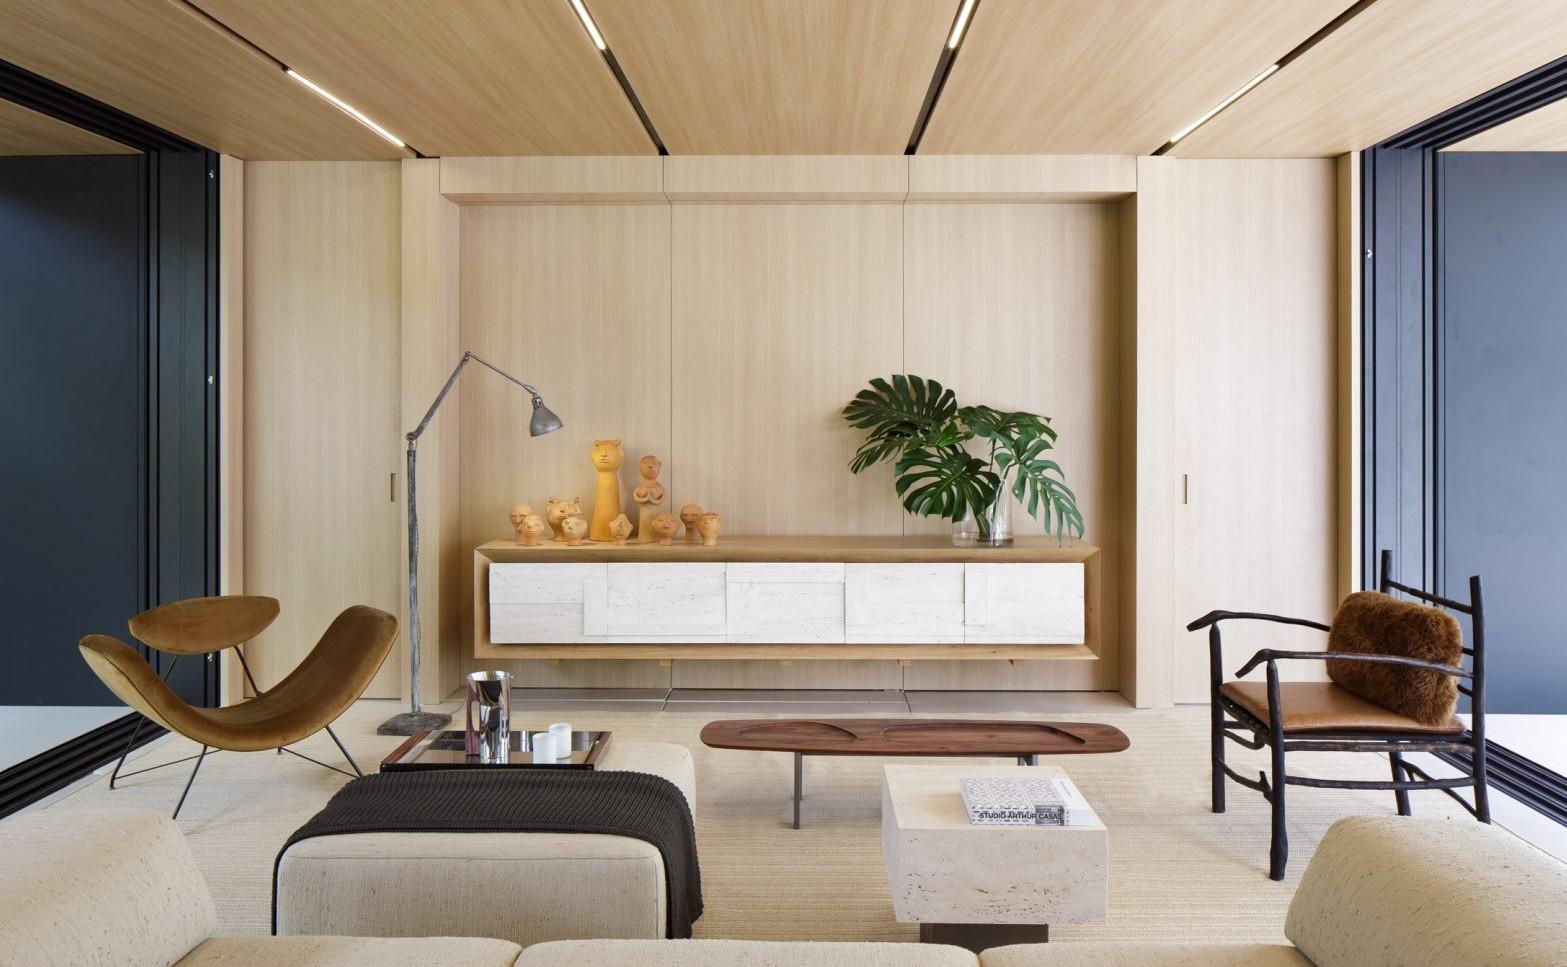 syshaus-studio-arthur-casas-architecture-prefab-brazil_dezeen_2364_col_4-1704x1136